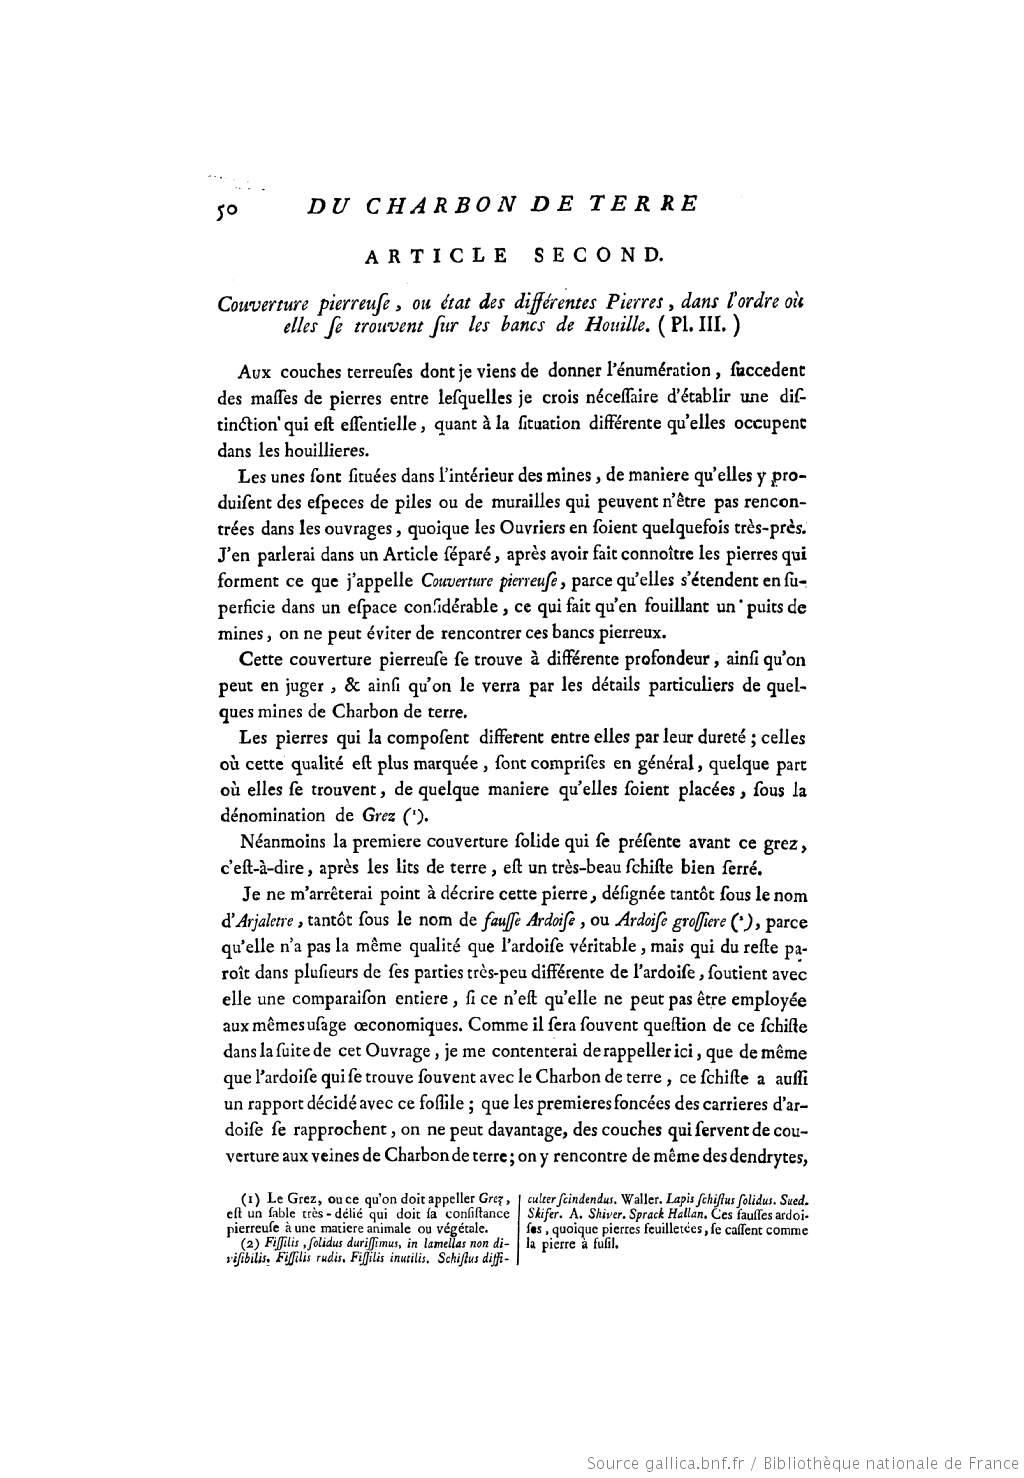 Argelette, Arjaletre (fausse ardoise ou ardoise grossière), Arjalette Artexp11